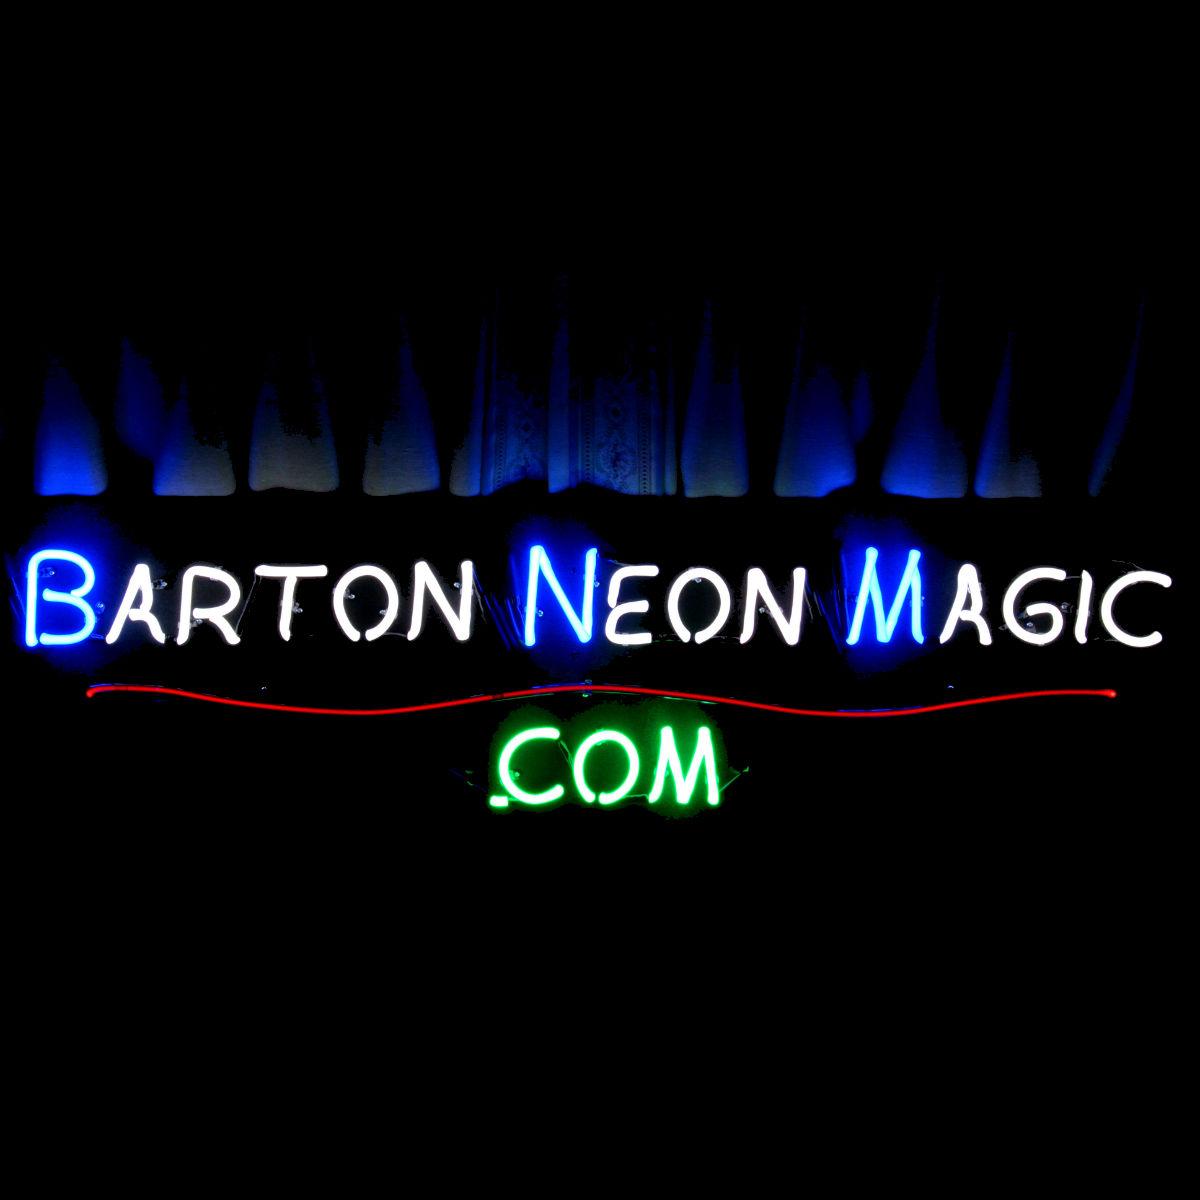 BartonNeonMagic.com - Fine Quality Packard Dealership Neon Signs by John Barton - former Packard New Car Dealer - BartonNeonMagic.com